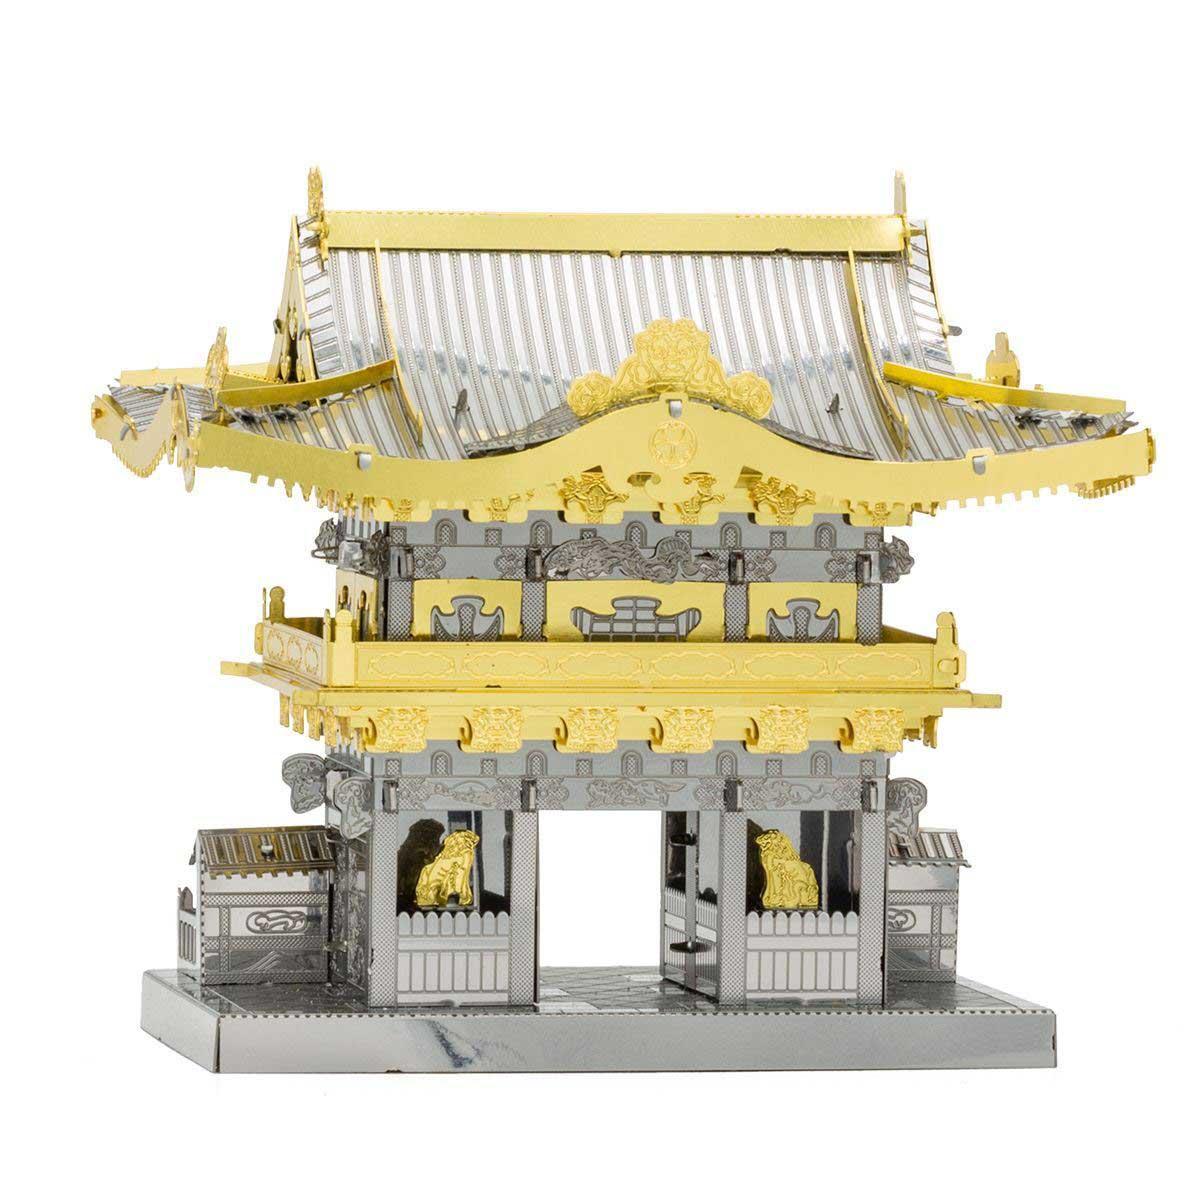 Yomei Gate Landmarks / Monuments Metal Puzzles